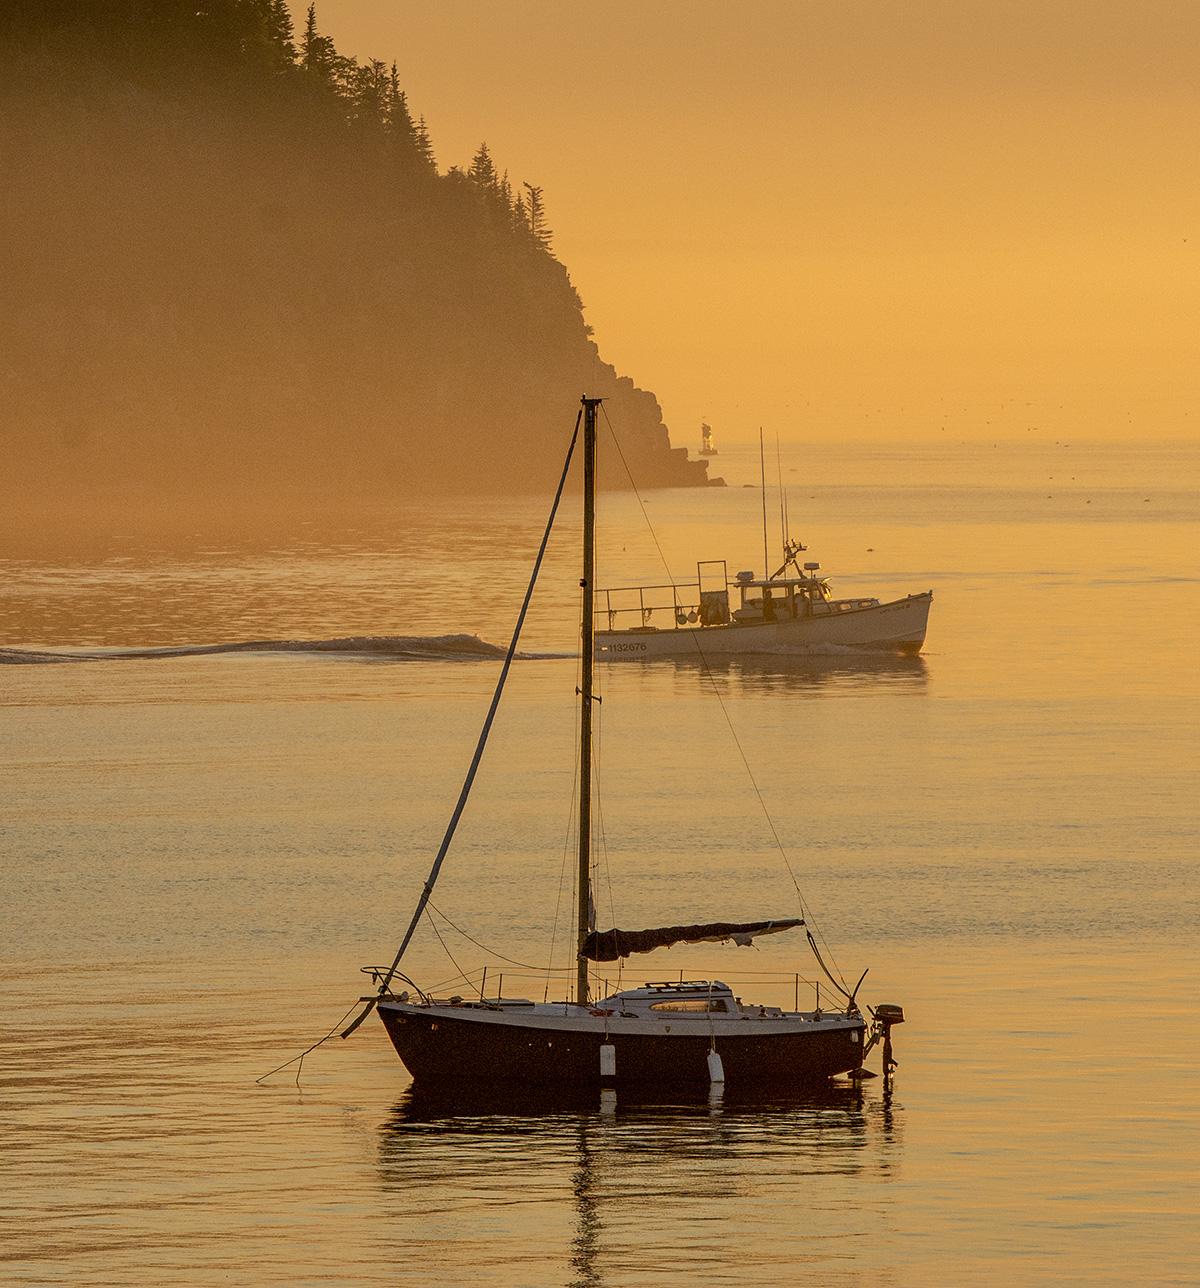 Bar_Harbor_Early_Morning_NIK